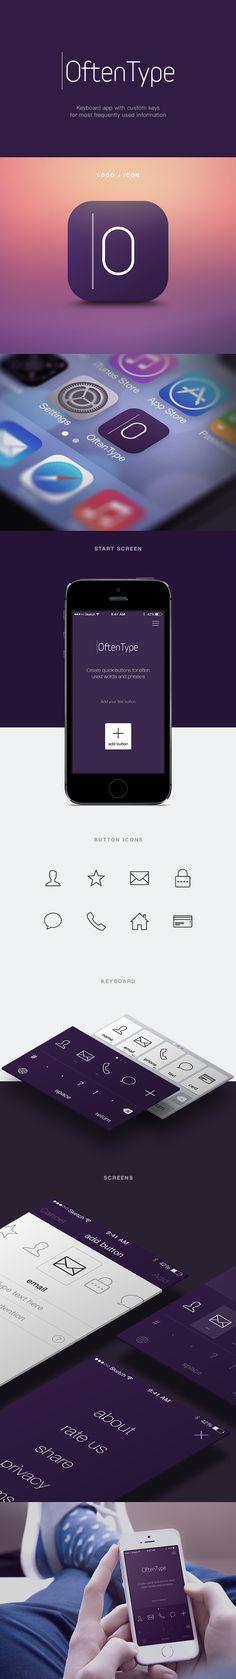 OftenType on Behance #oftentype #app #ios8 #keyboard #iphone #ui #design